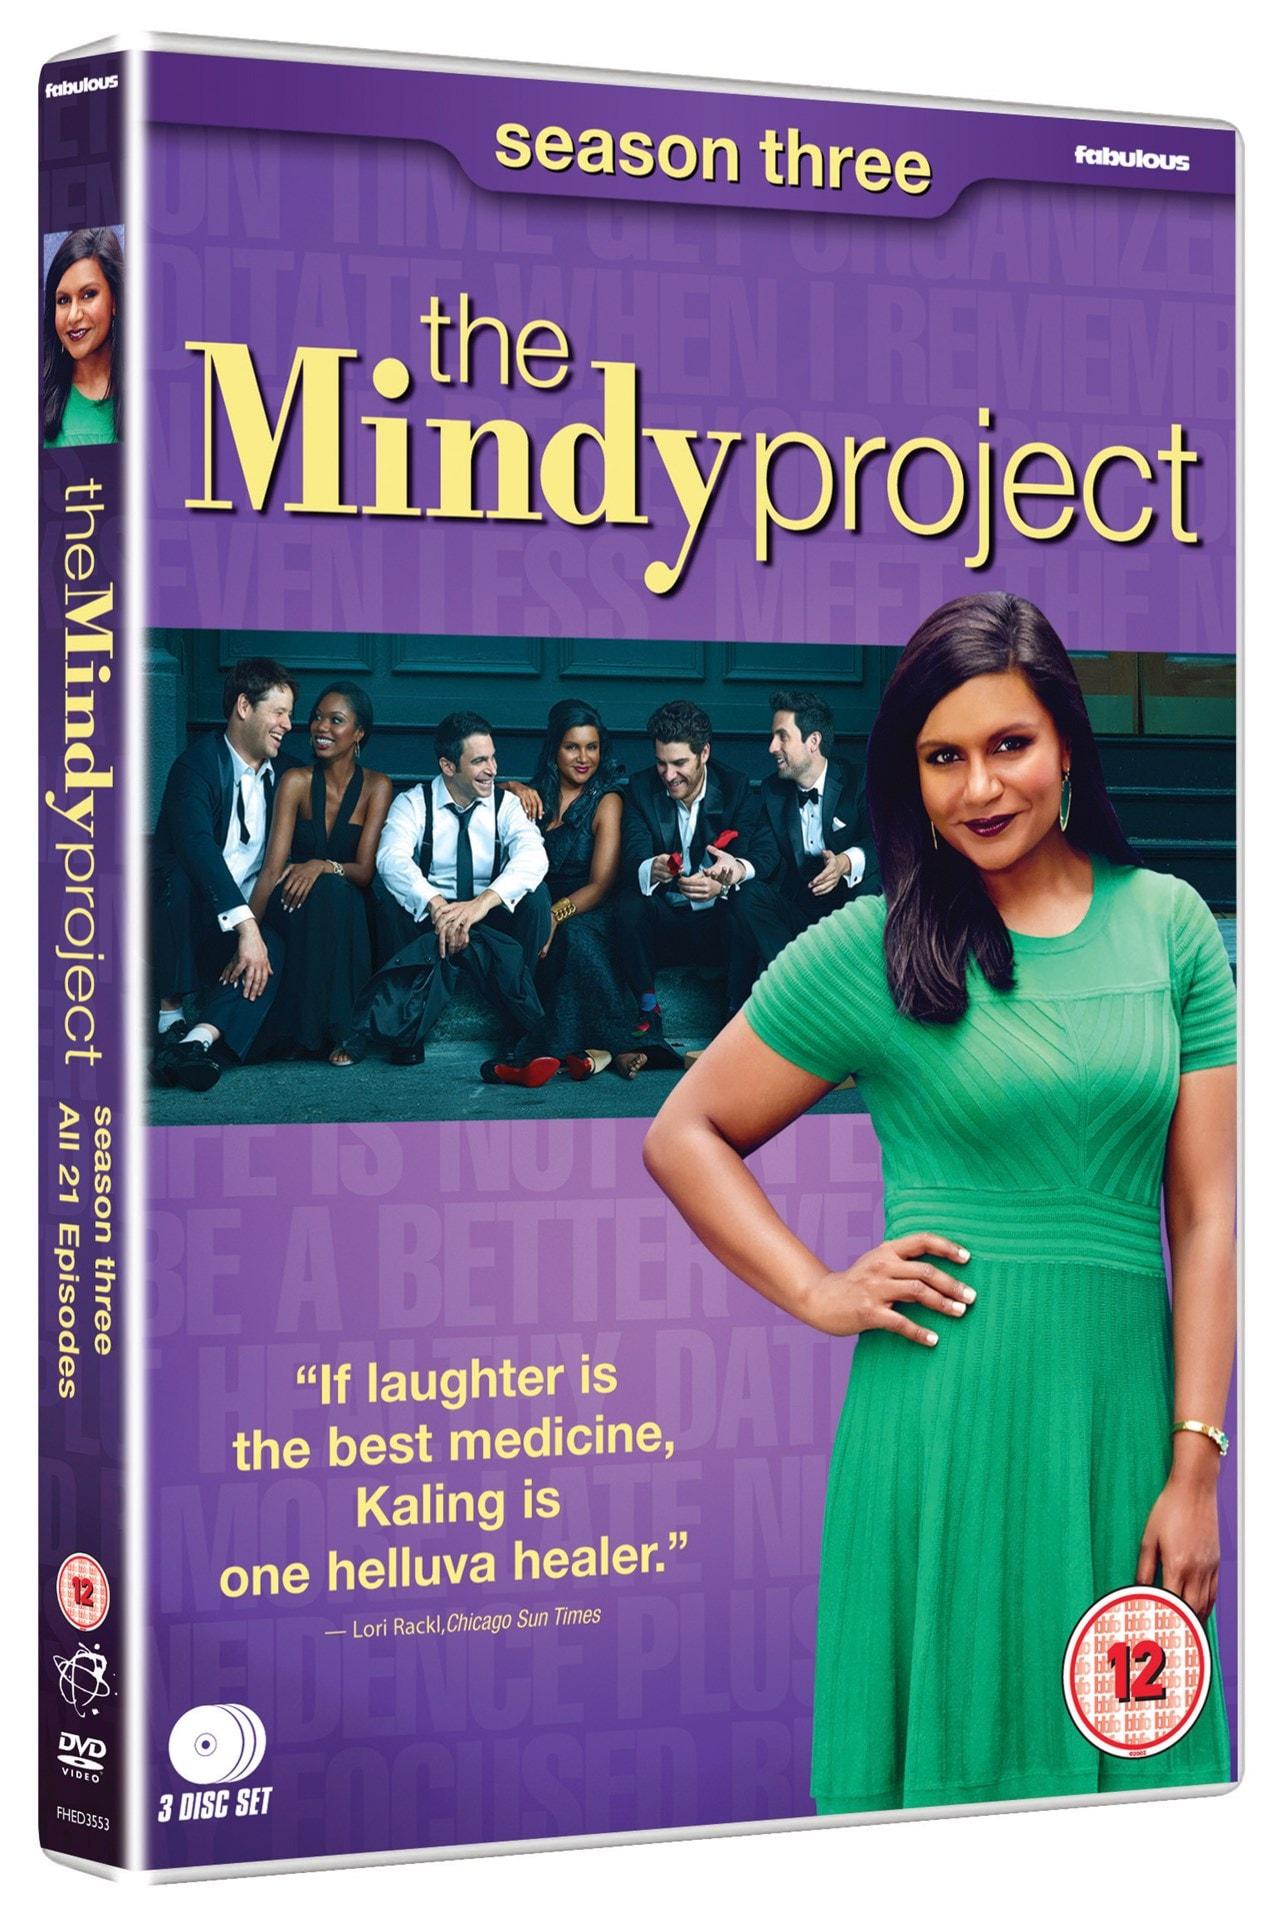 The Mindy Project: Season 3 - 2